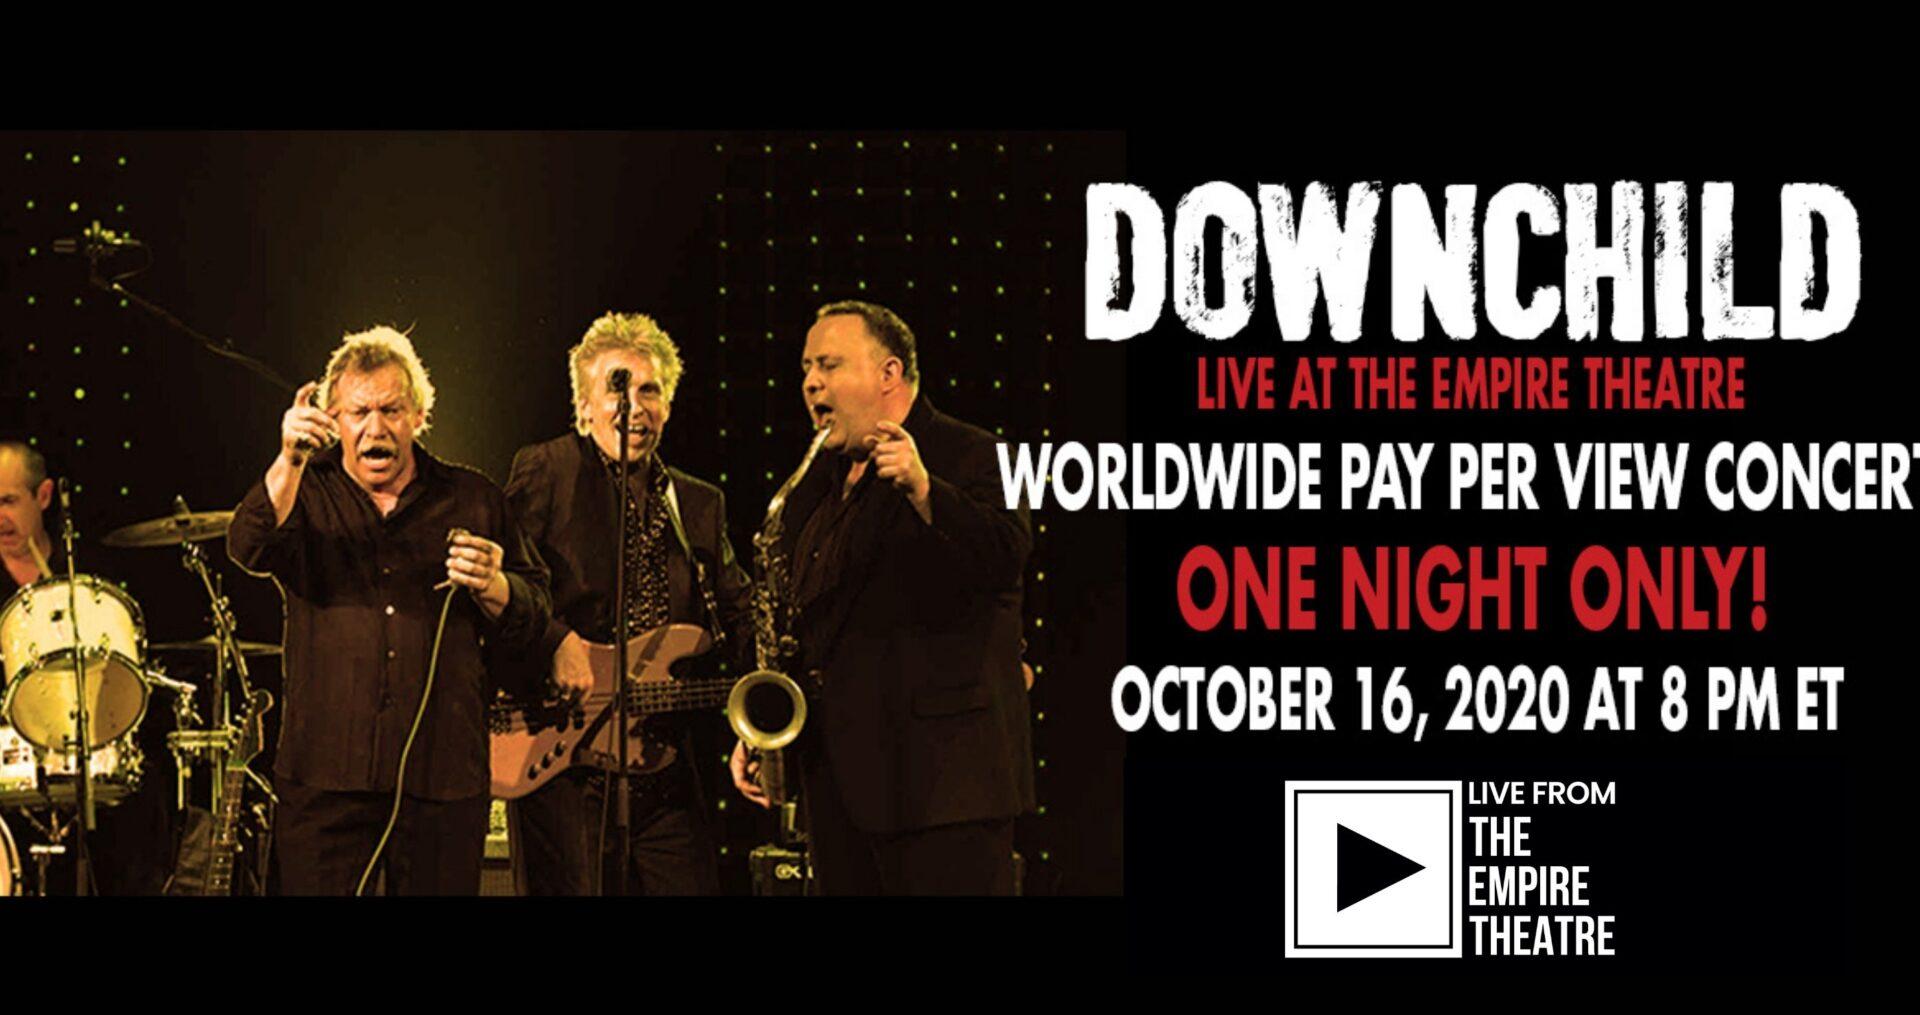 Downchild Live Stream Concert